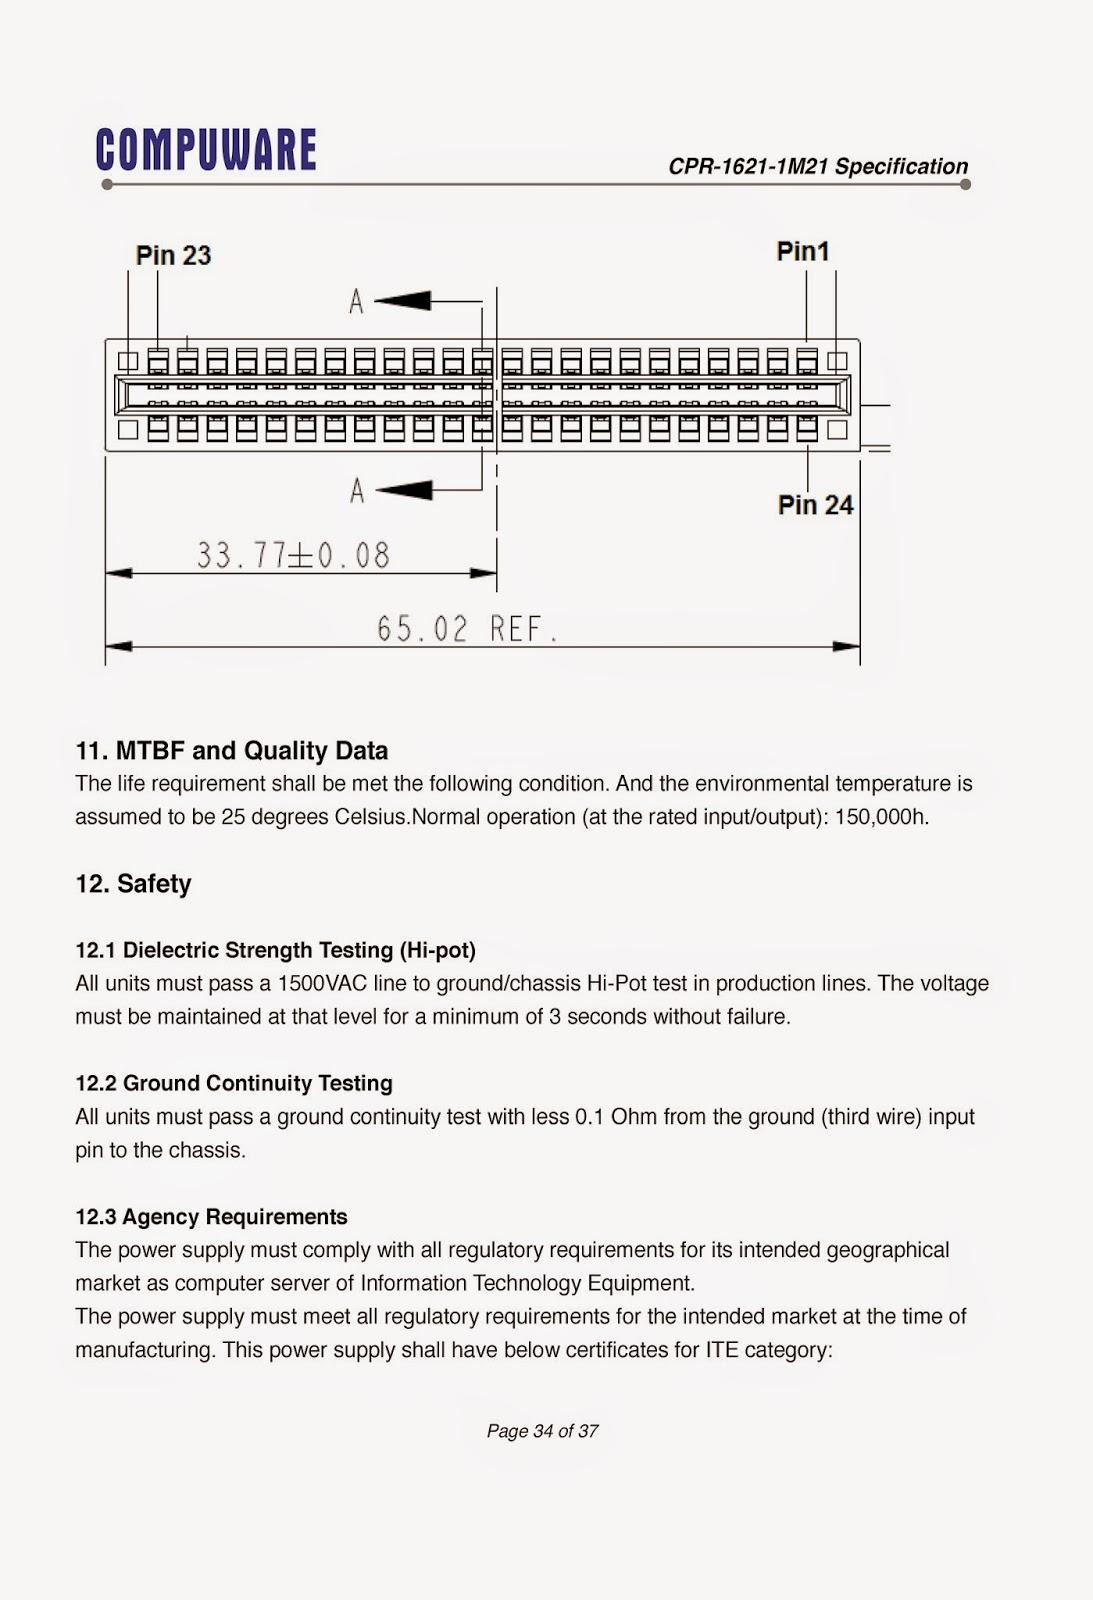 Supermicro Power Supply PWS-1K41P-1R rev1.1 Occasion | Dmitry Pakhatov